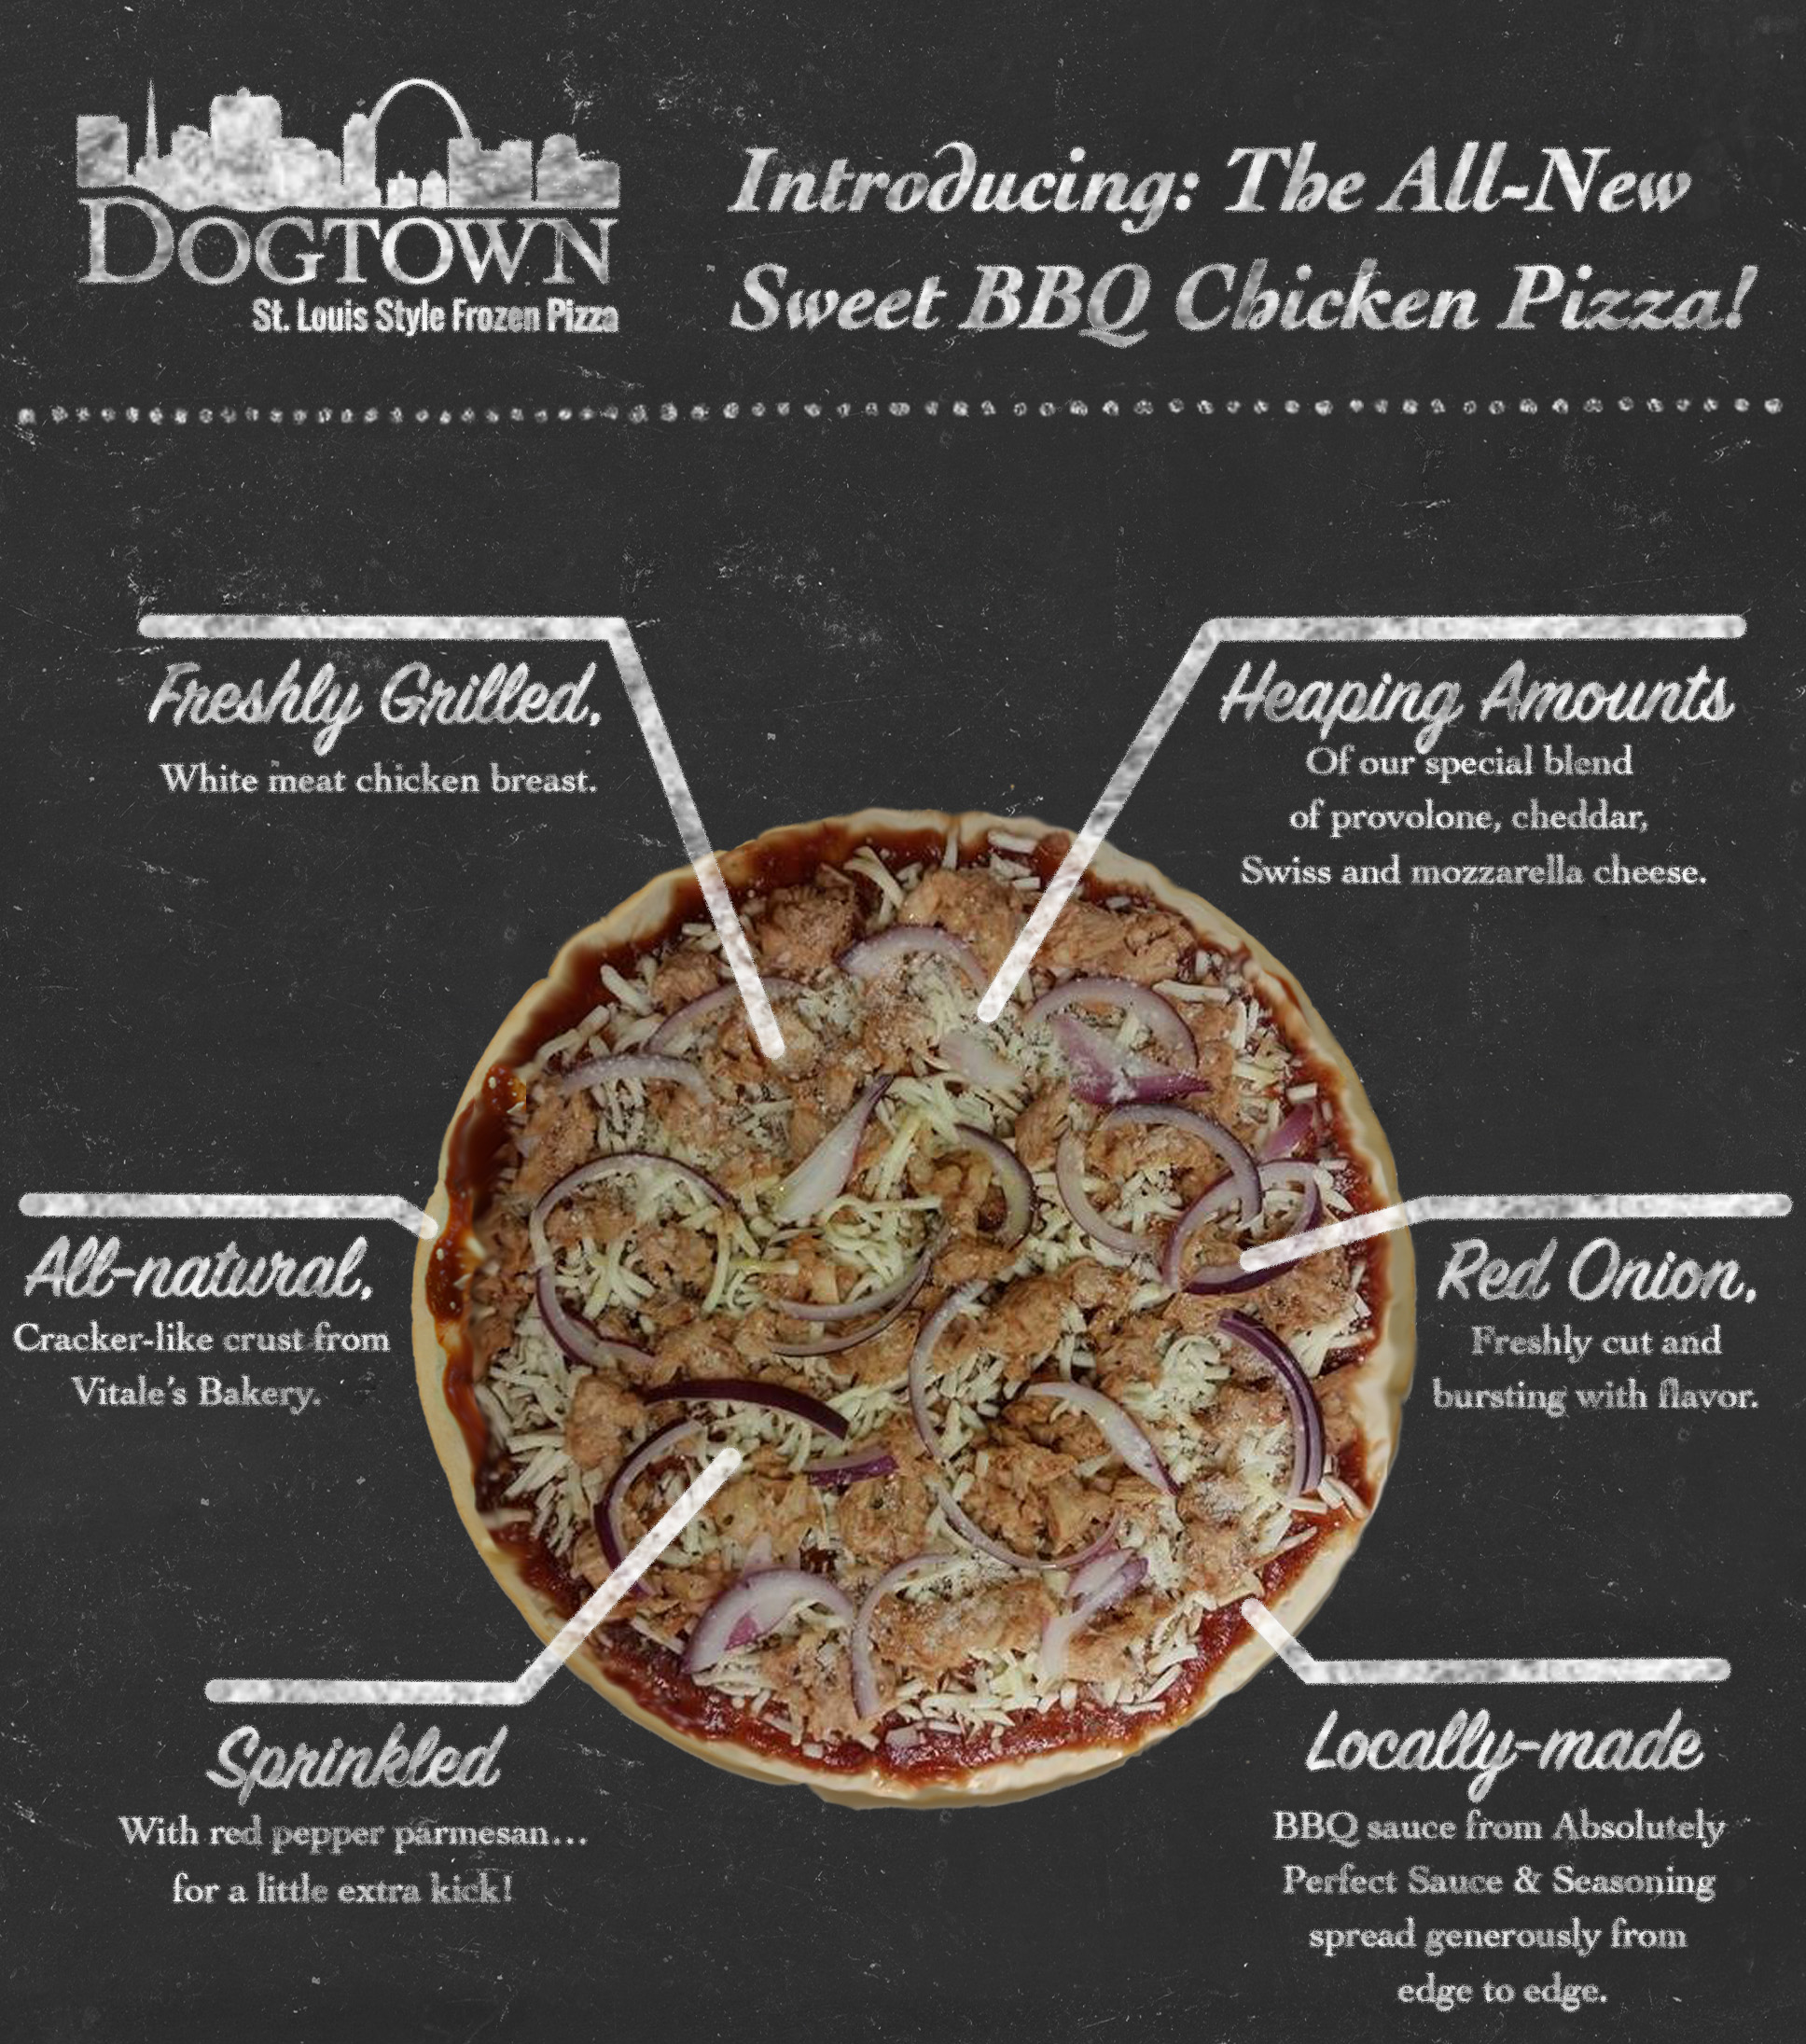 Sweet BBQ Chicken Dogtown Pizza variety